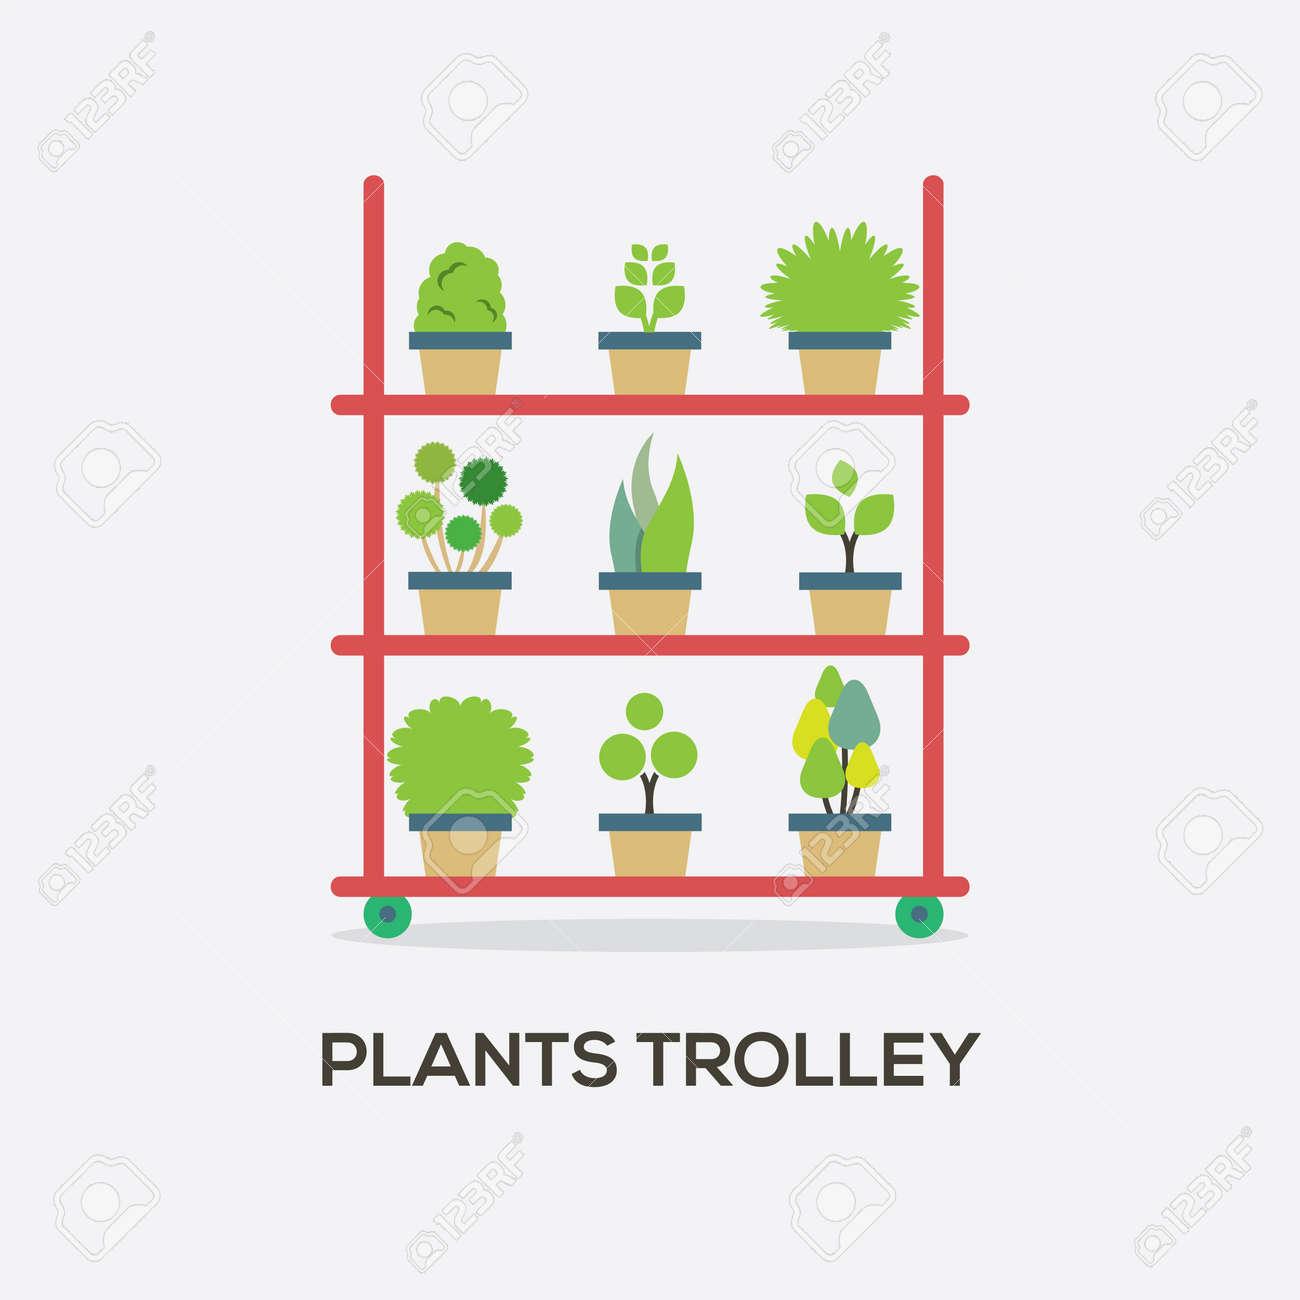 pflanzen trolley